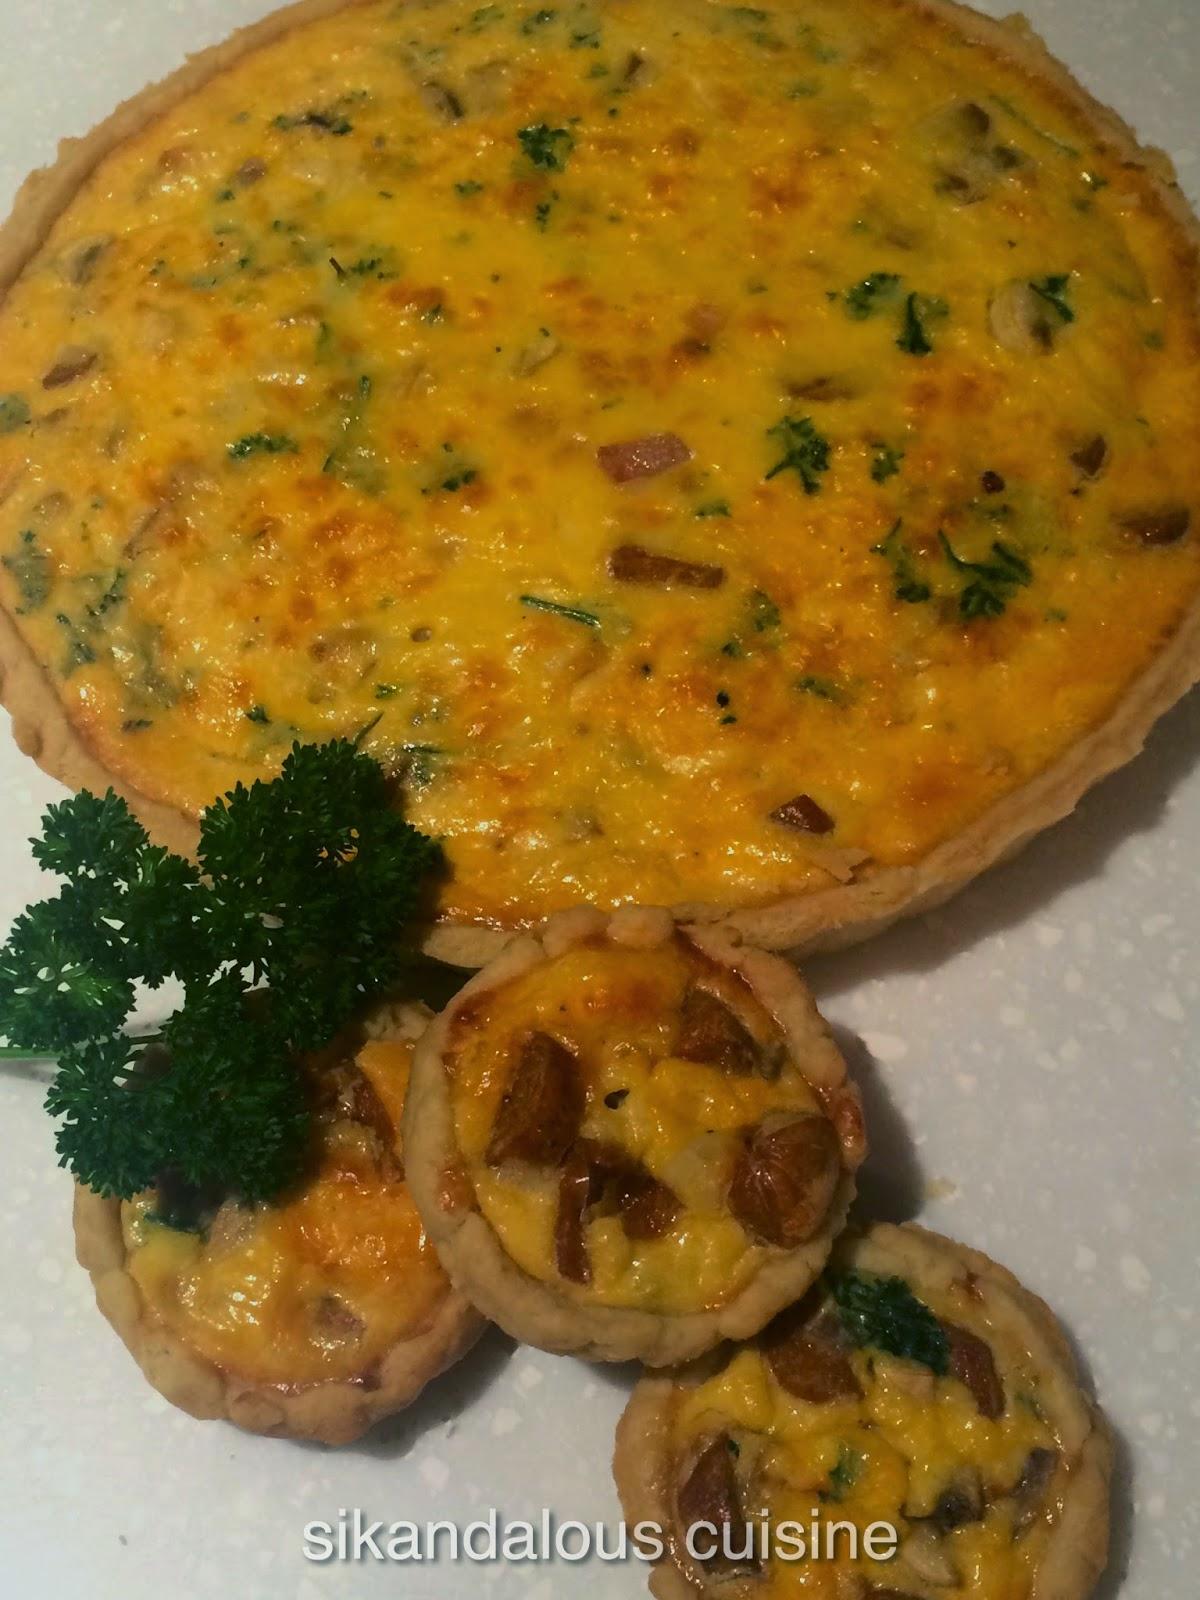 Sikandalous cuisine quiche lorraine for Cuisine quiche lorraine